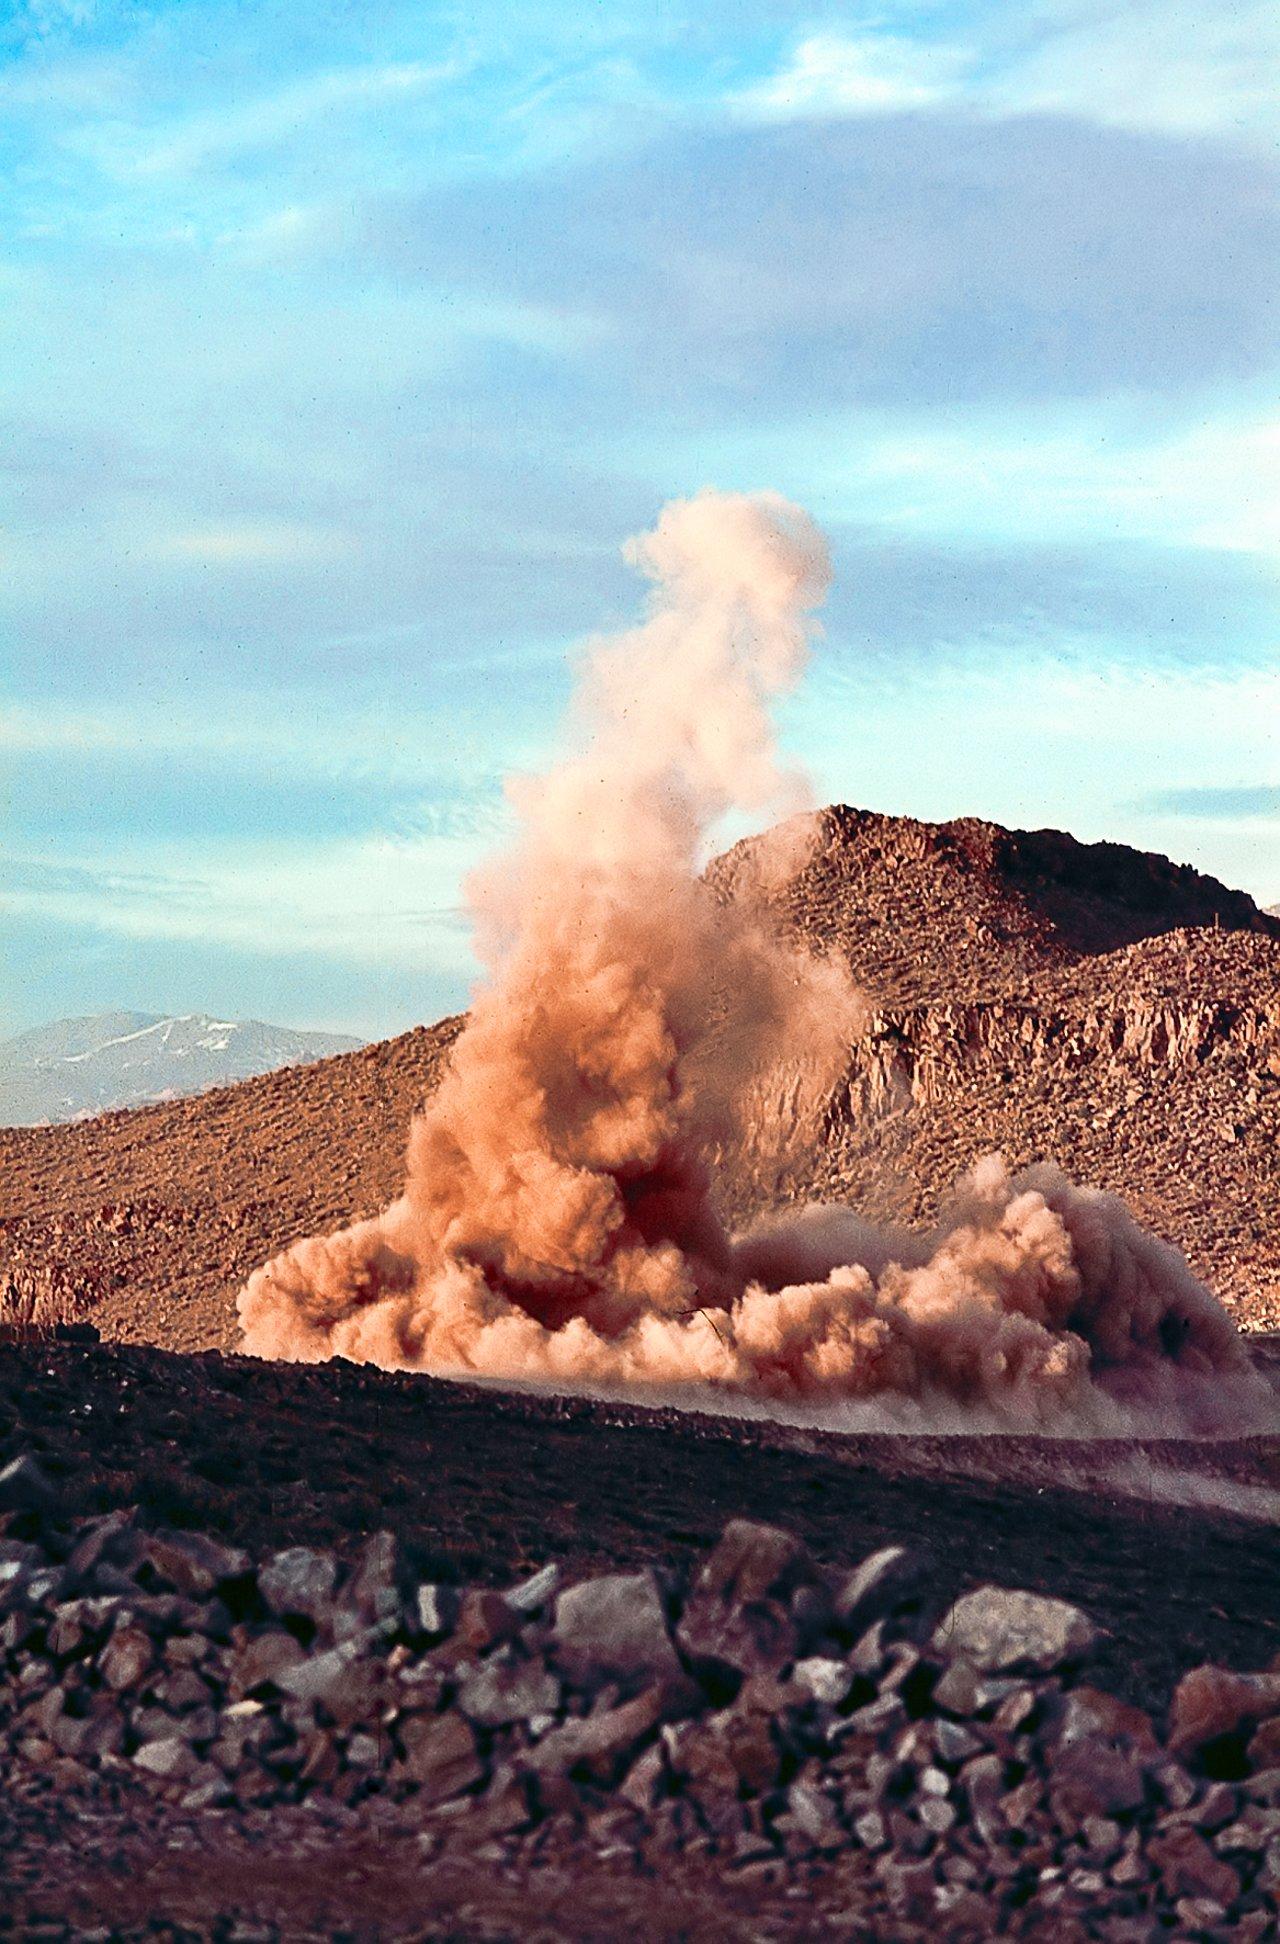 Dust cloud after rock blasting at La Silla